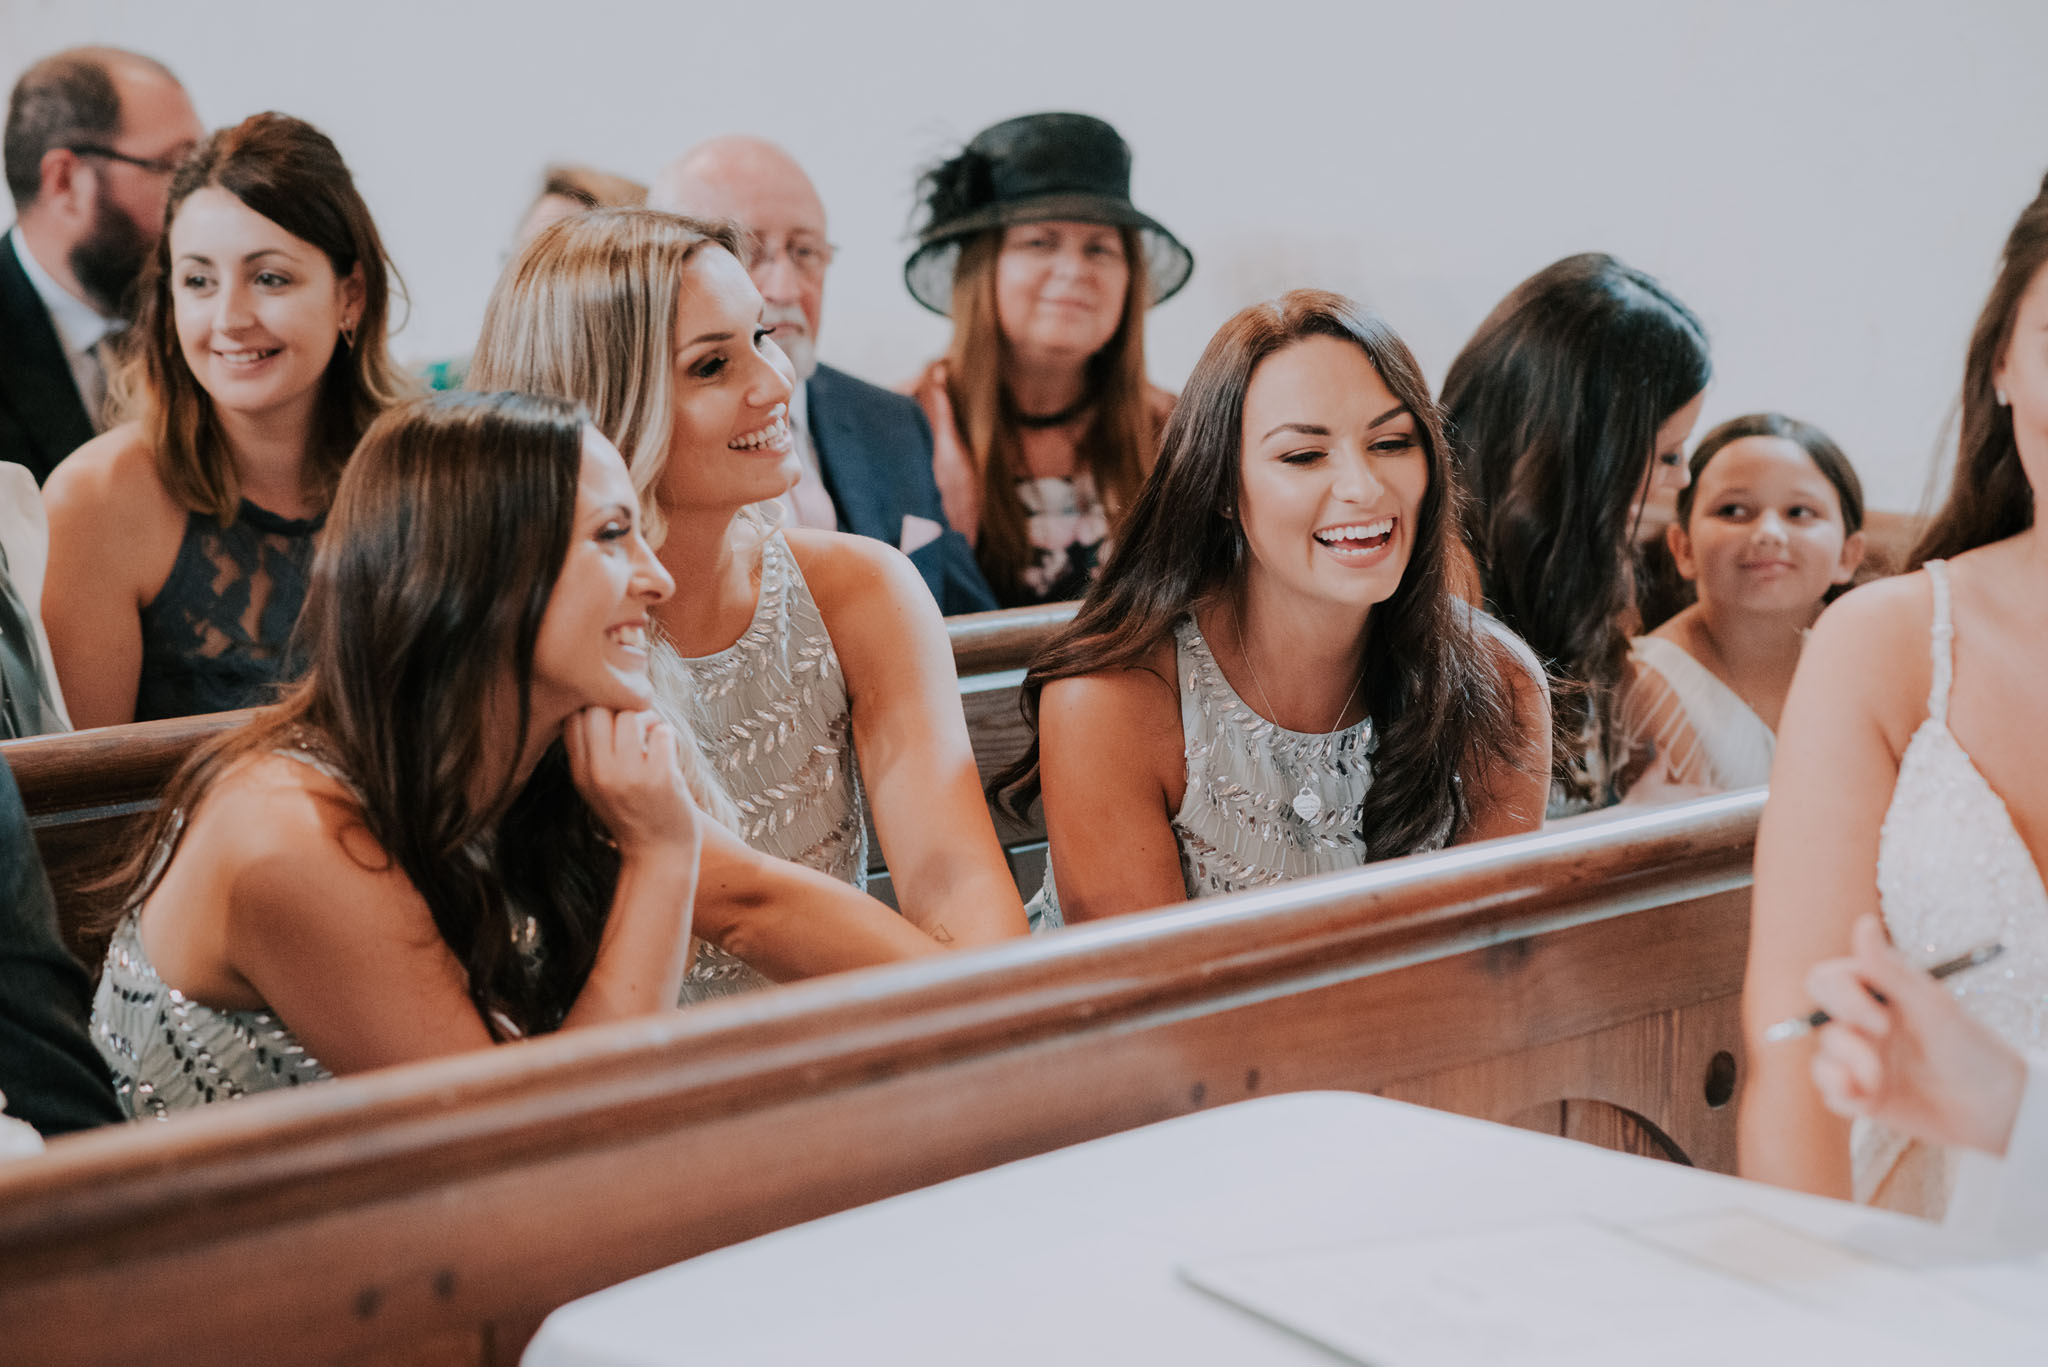 wedding-photographer-glewstone-court-hereford-scott-stockwell-photography208.jpg